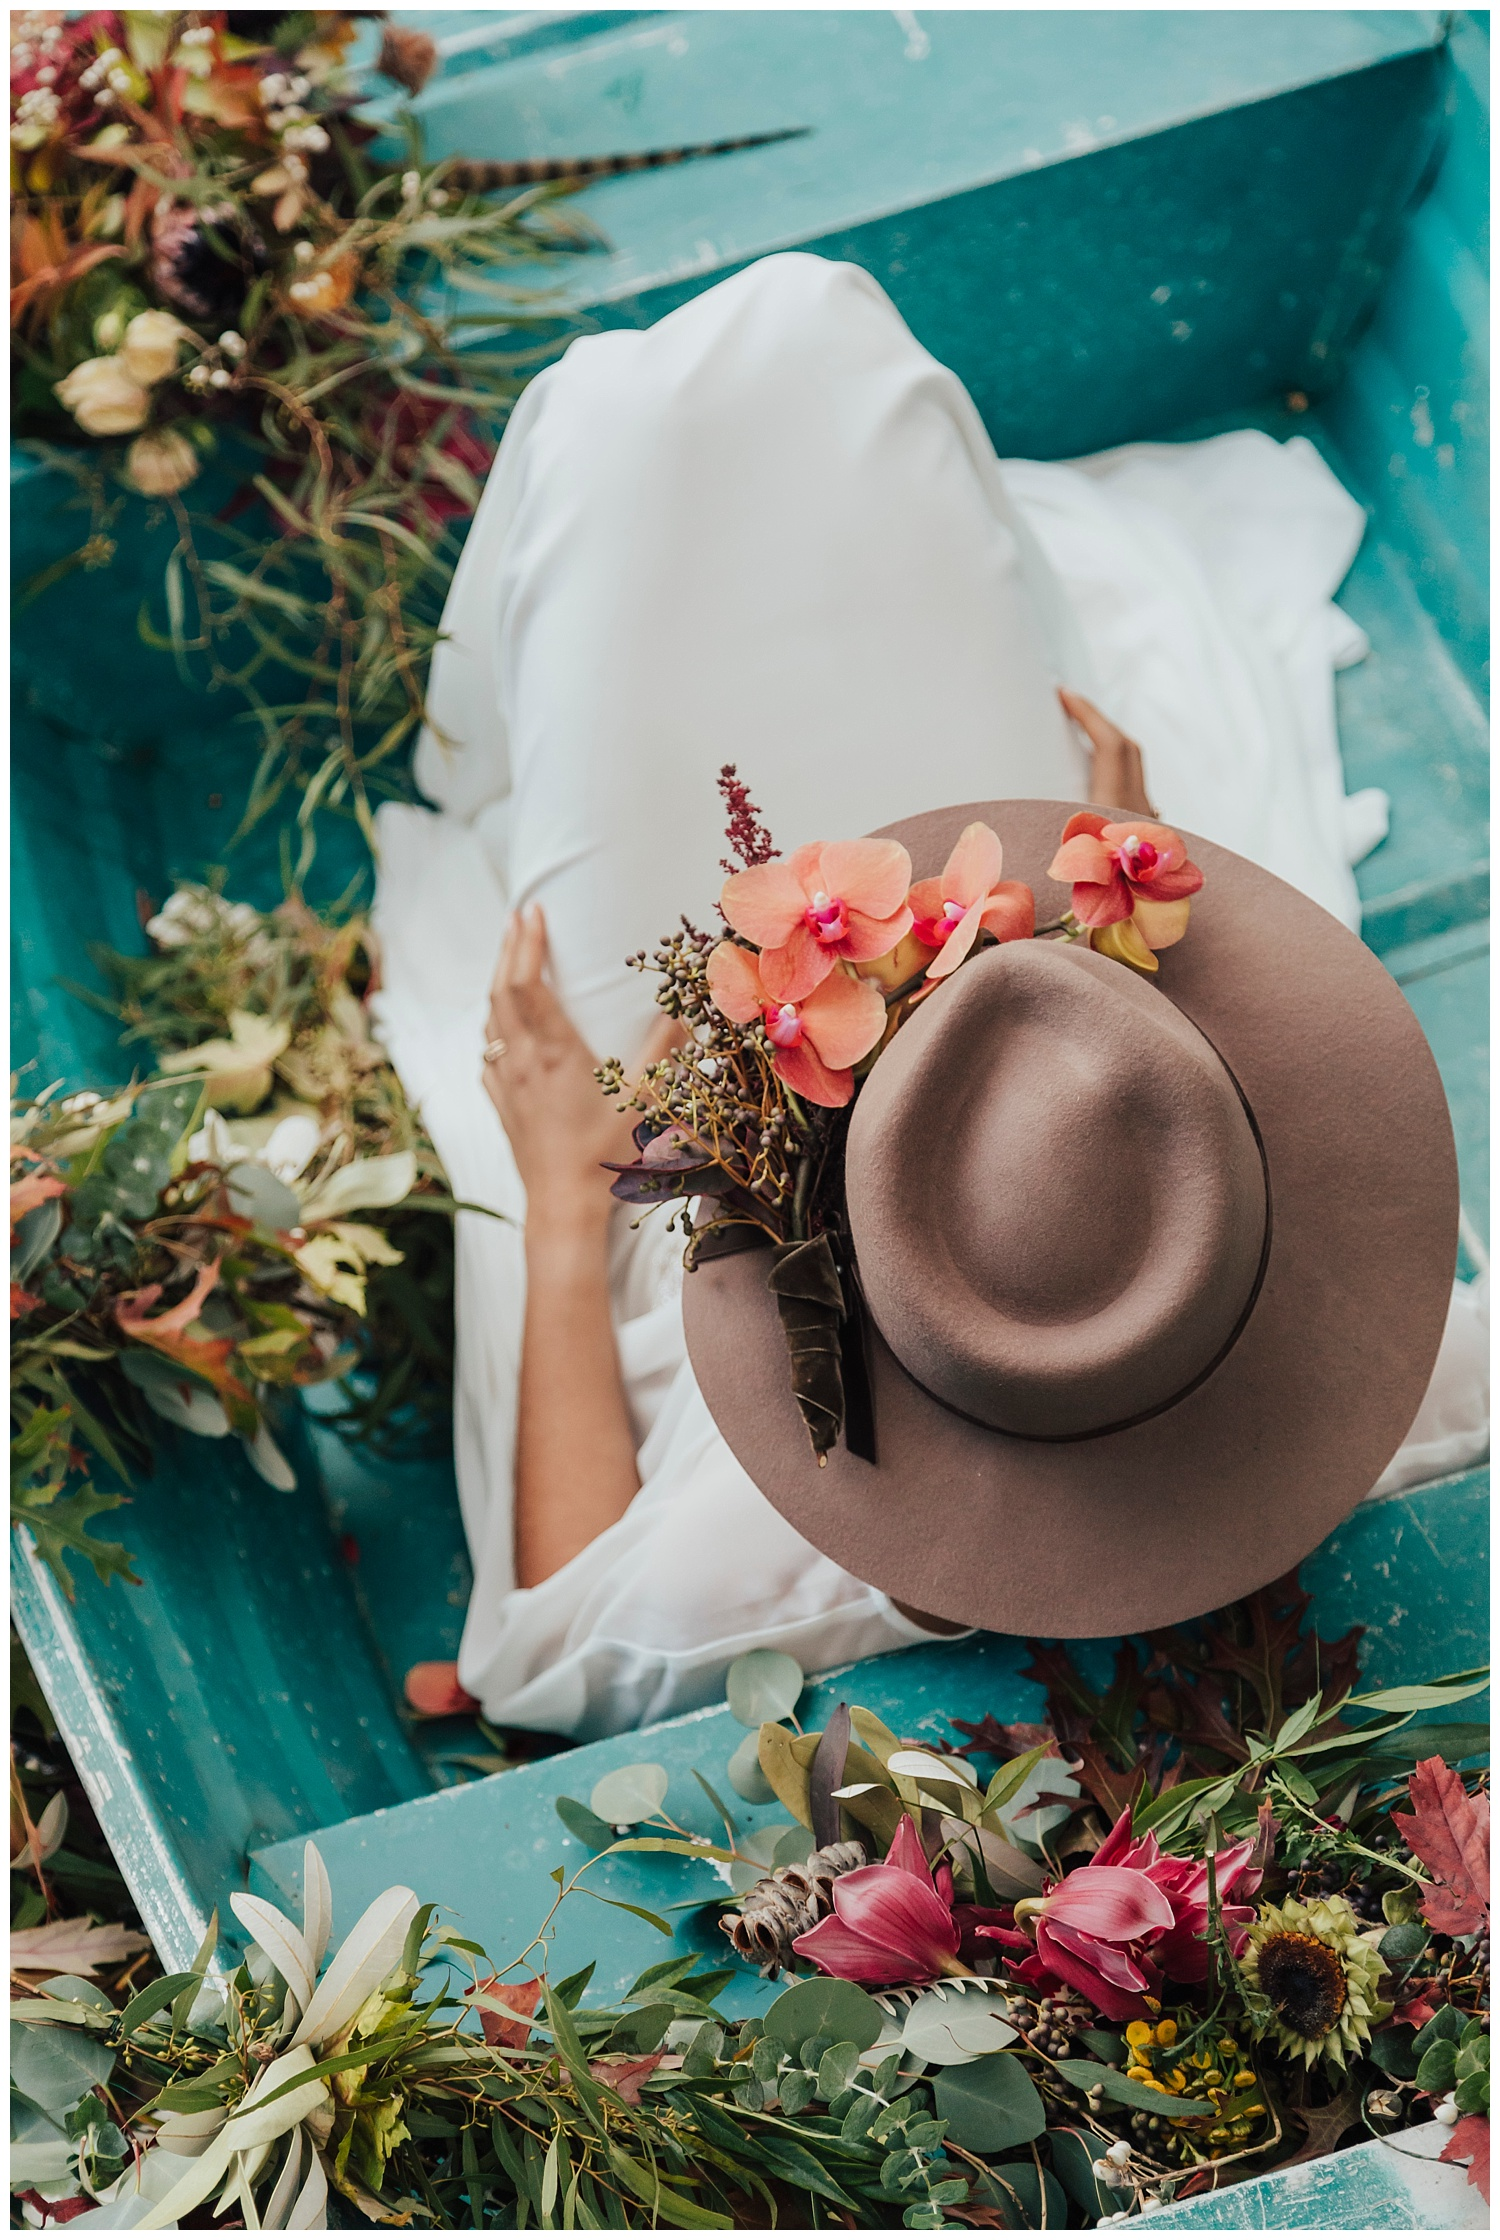 carol oliva photography boho bride in boat